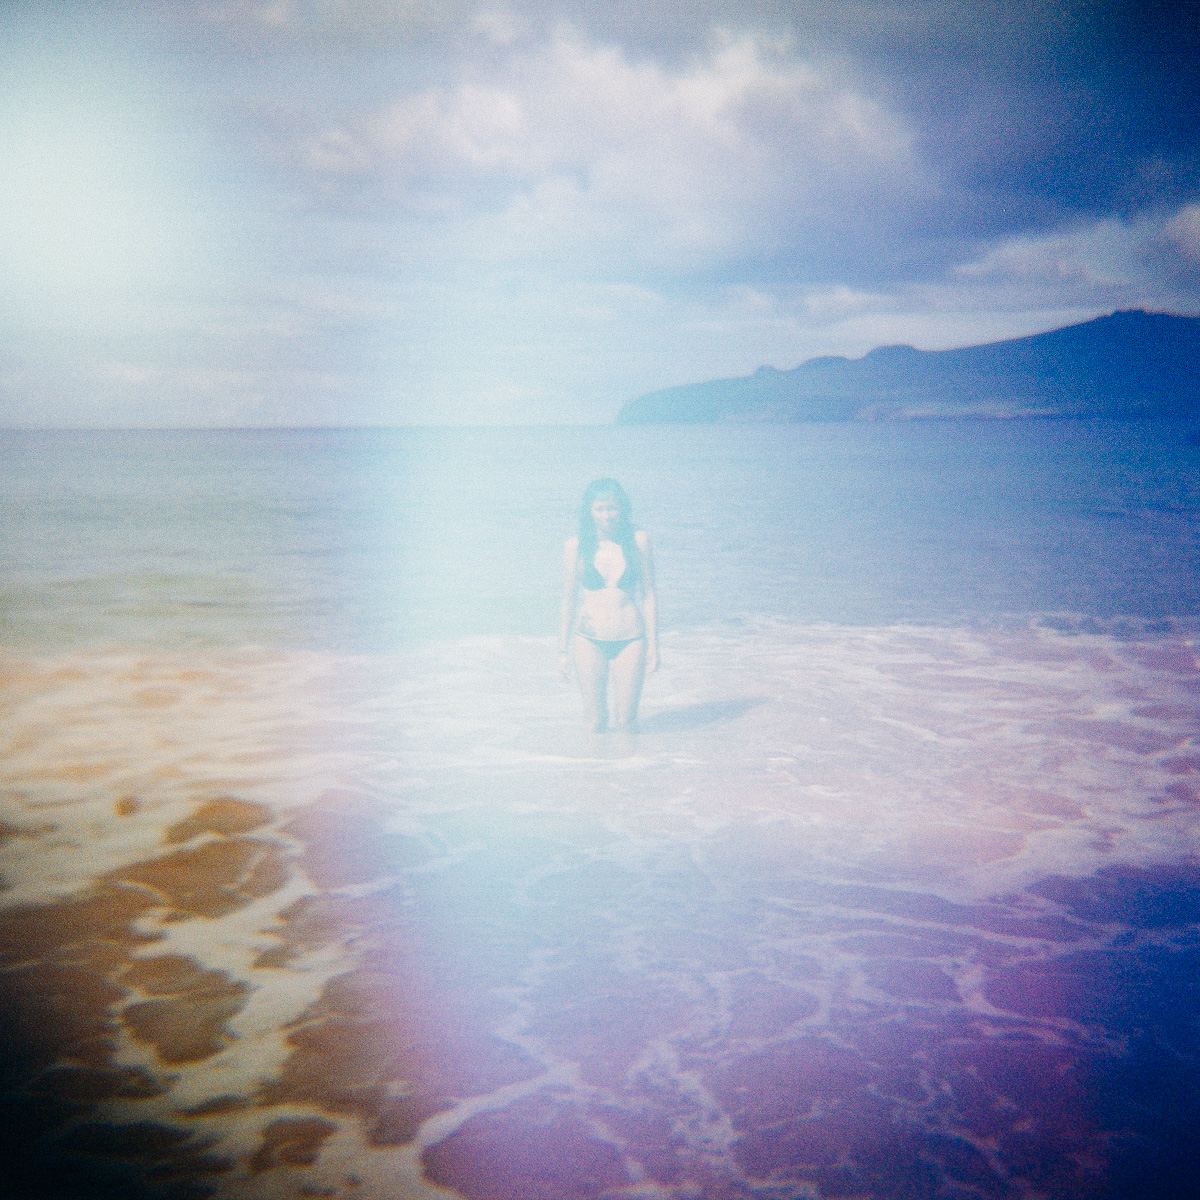 renee-lusano-easter-island-lomo-diana-1.jpg